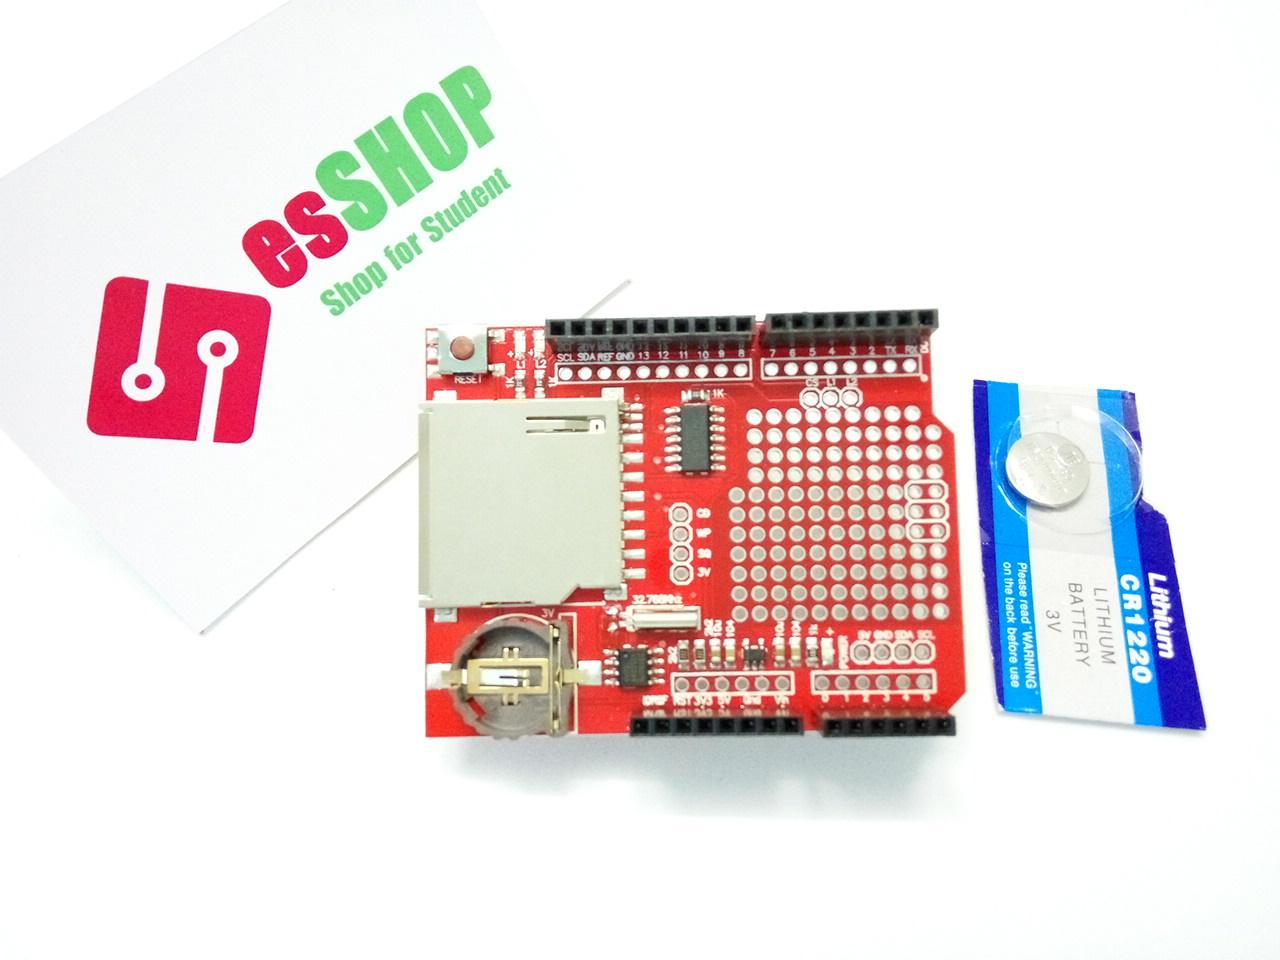 B0251 - Shield Arduino ghi dữ liệu logger XD-204